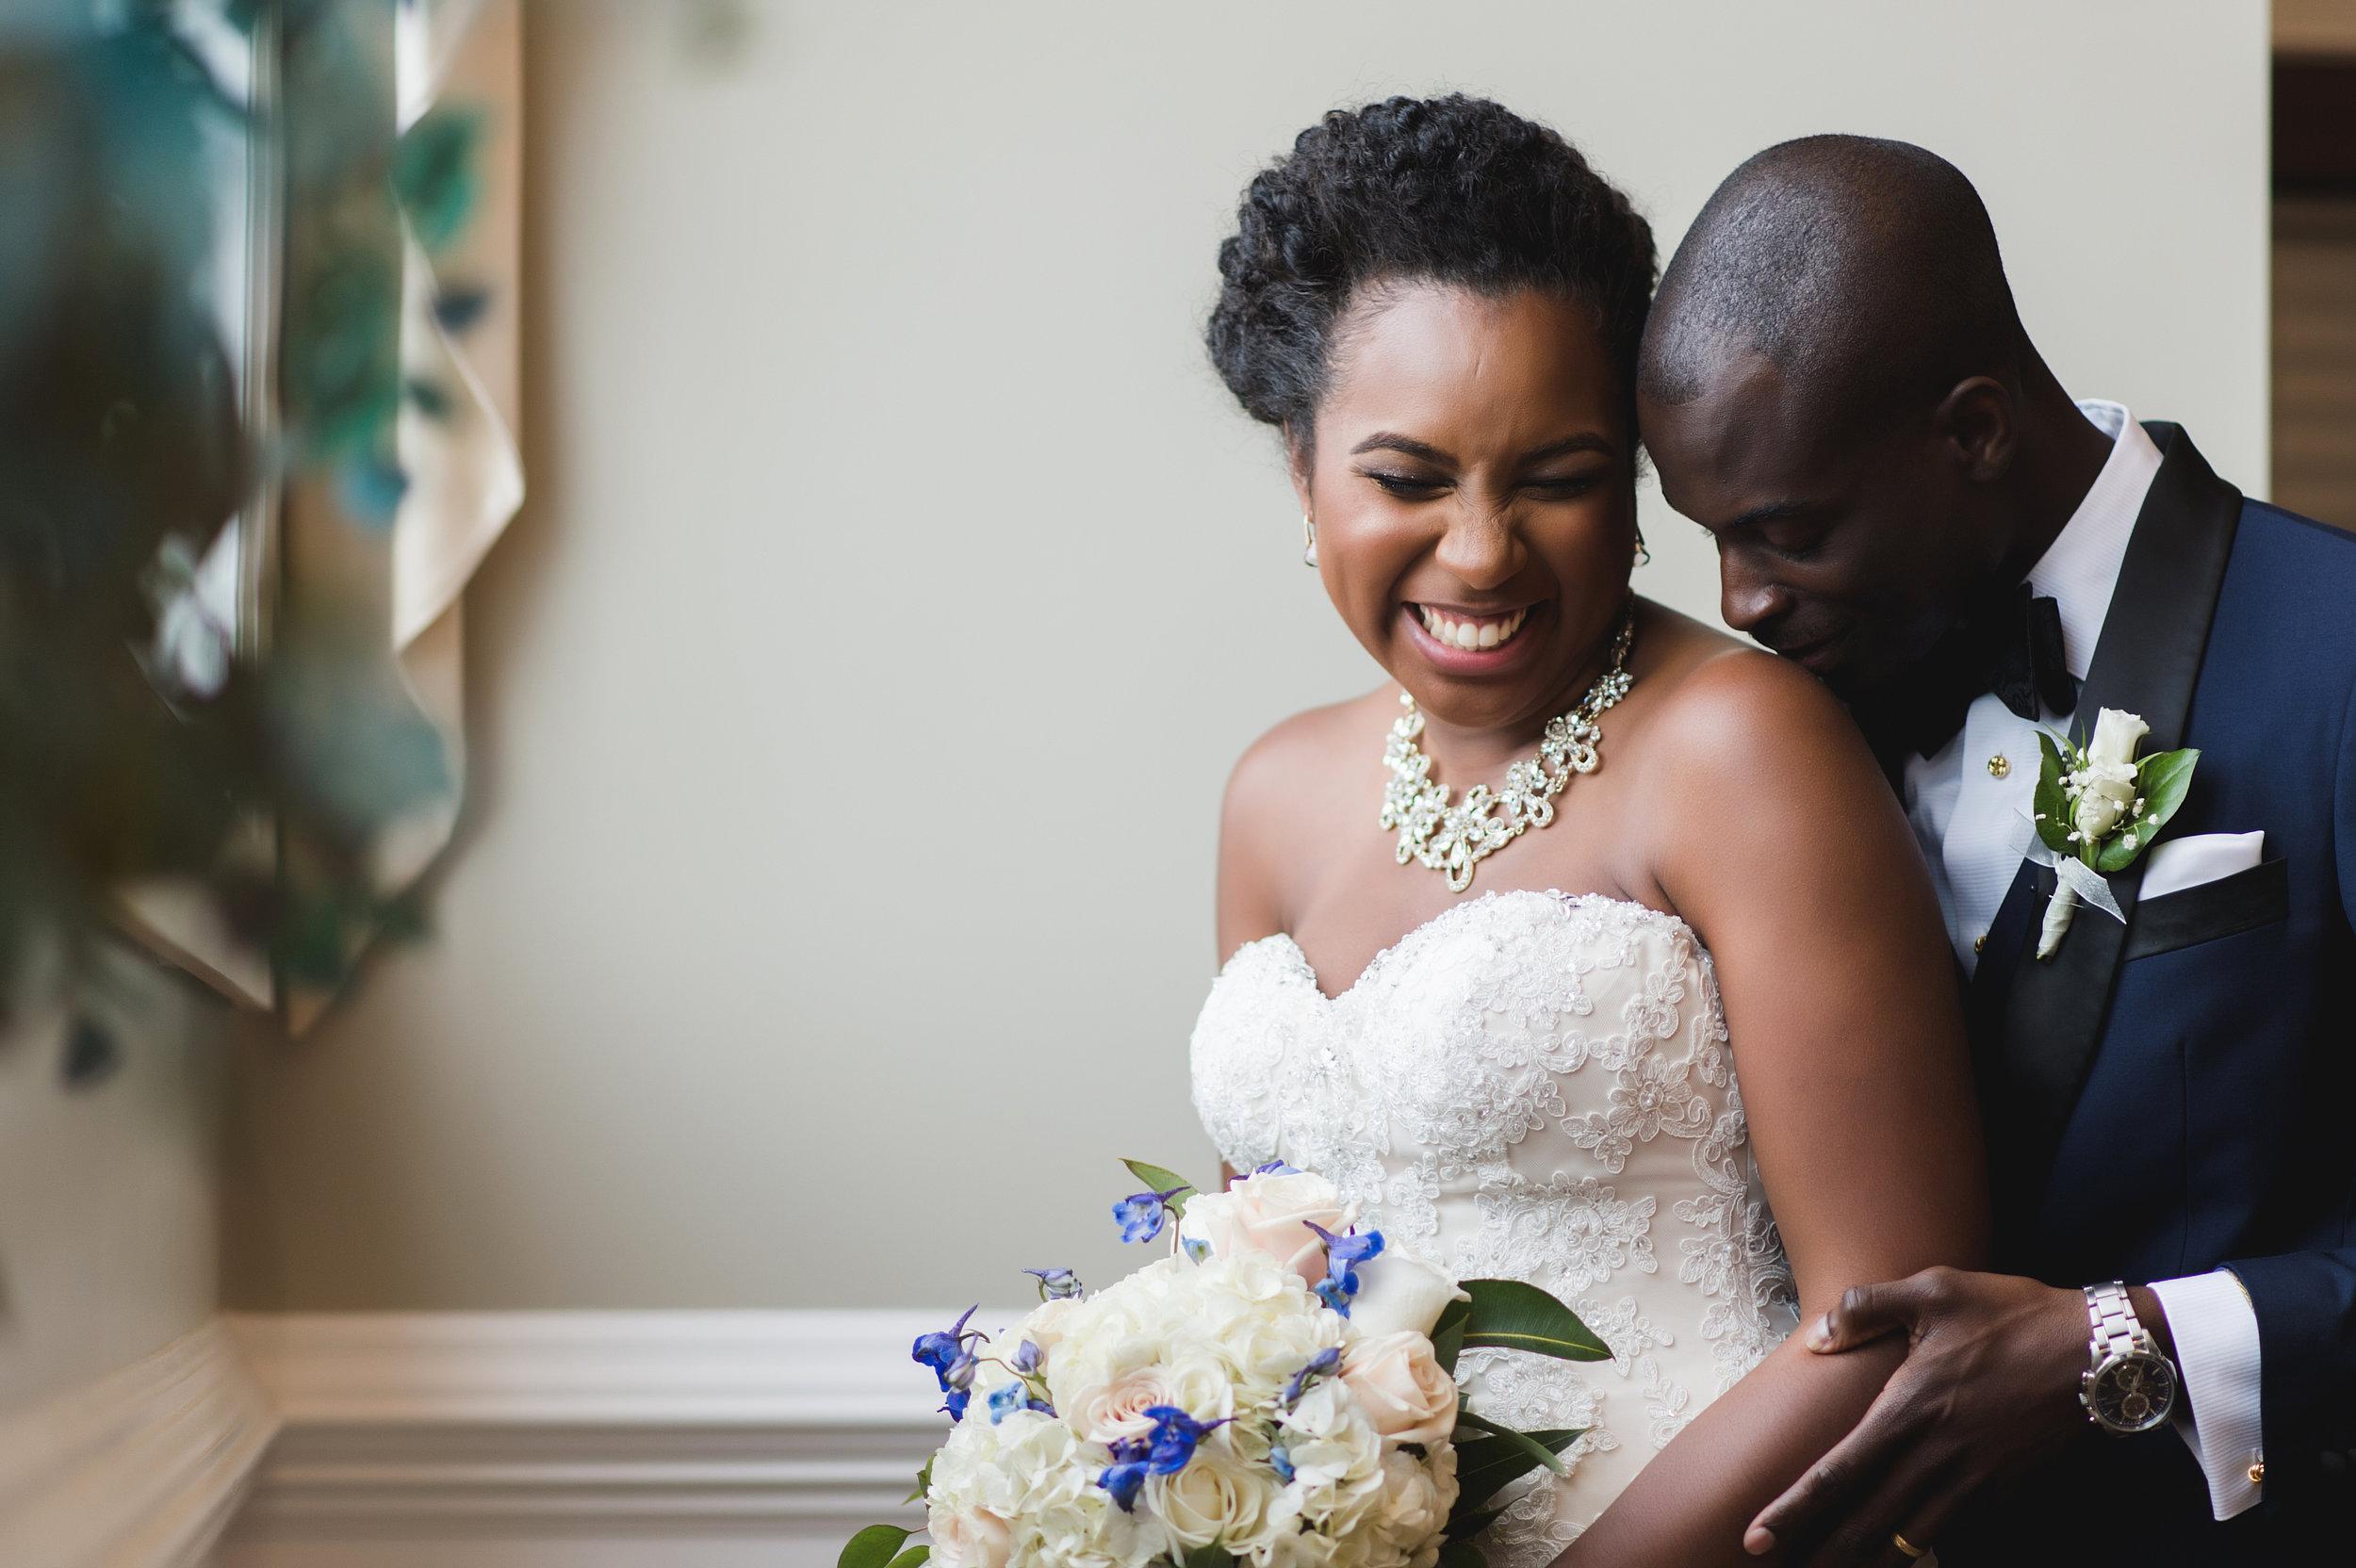 black-couple-laughing-wedding-day